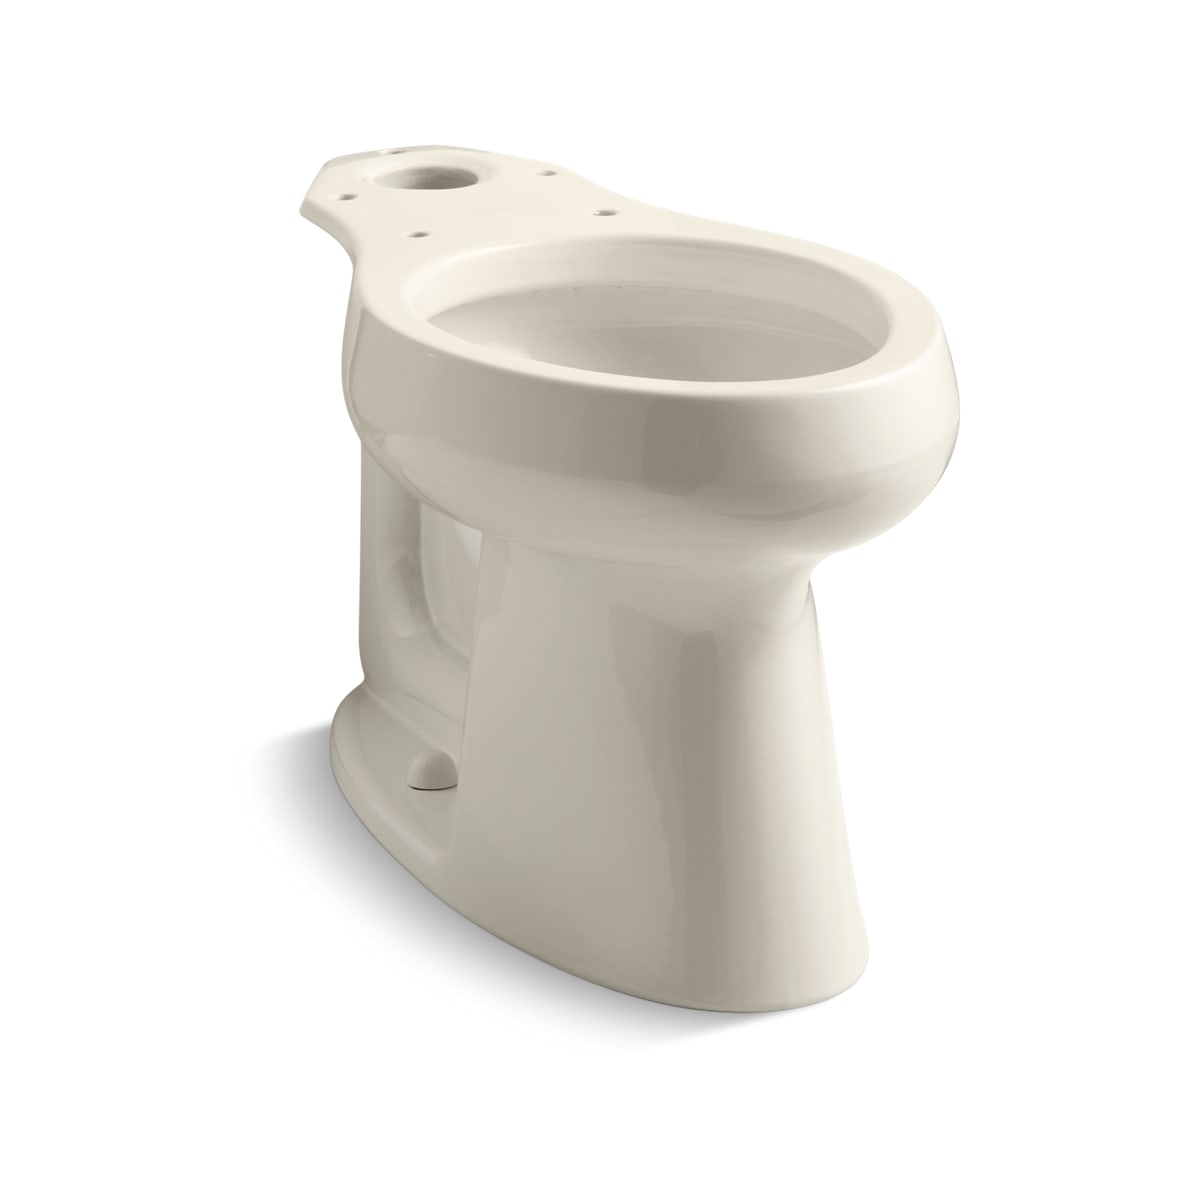 Astonishing Kohler K 4199 0 White Comfort Height Elongated Bowl Only Machost Co Dining Chair Design Ideas Machostcouk